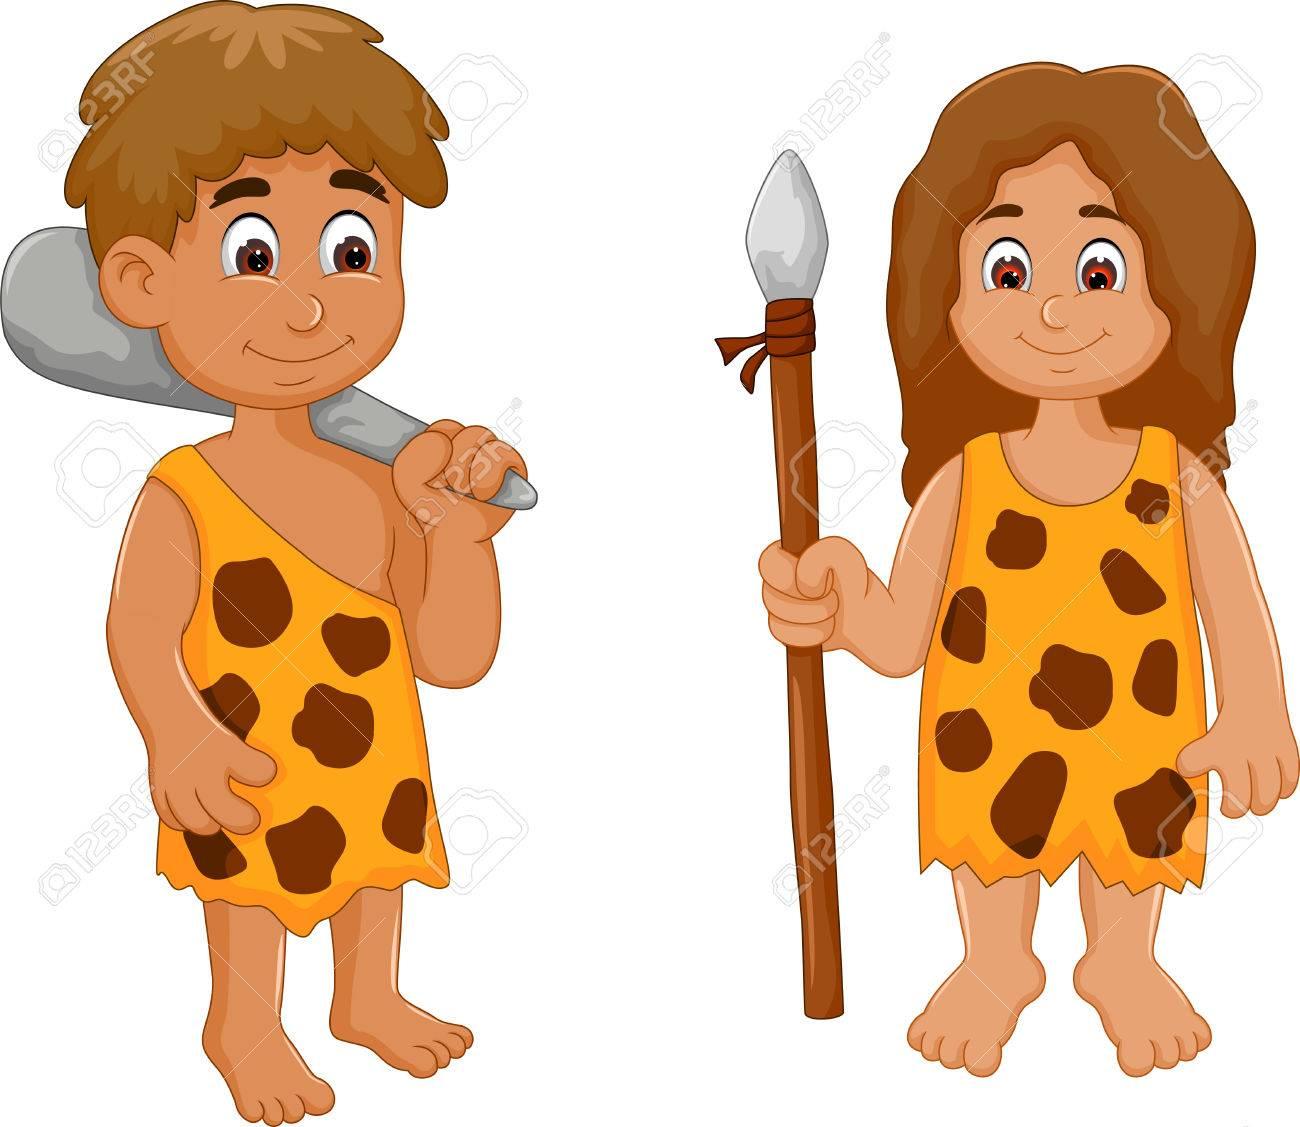 Funny cute couple ancient human cartoon. - 74301183